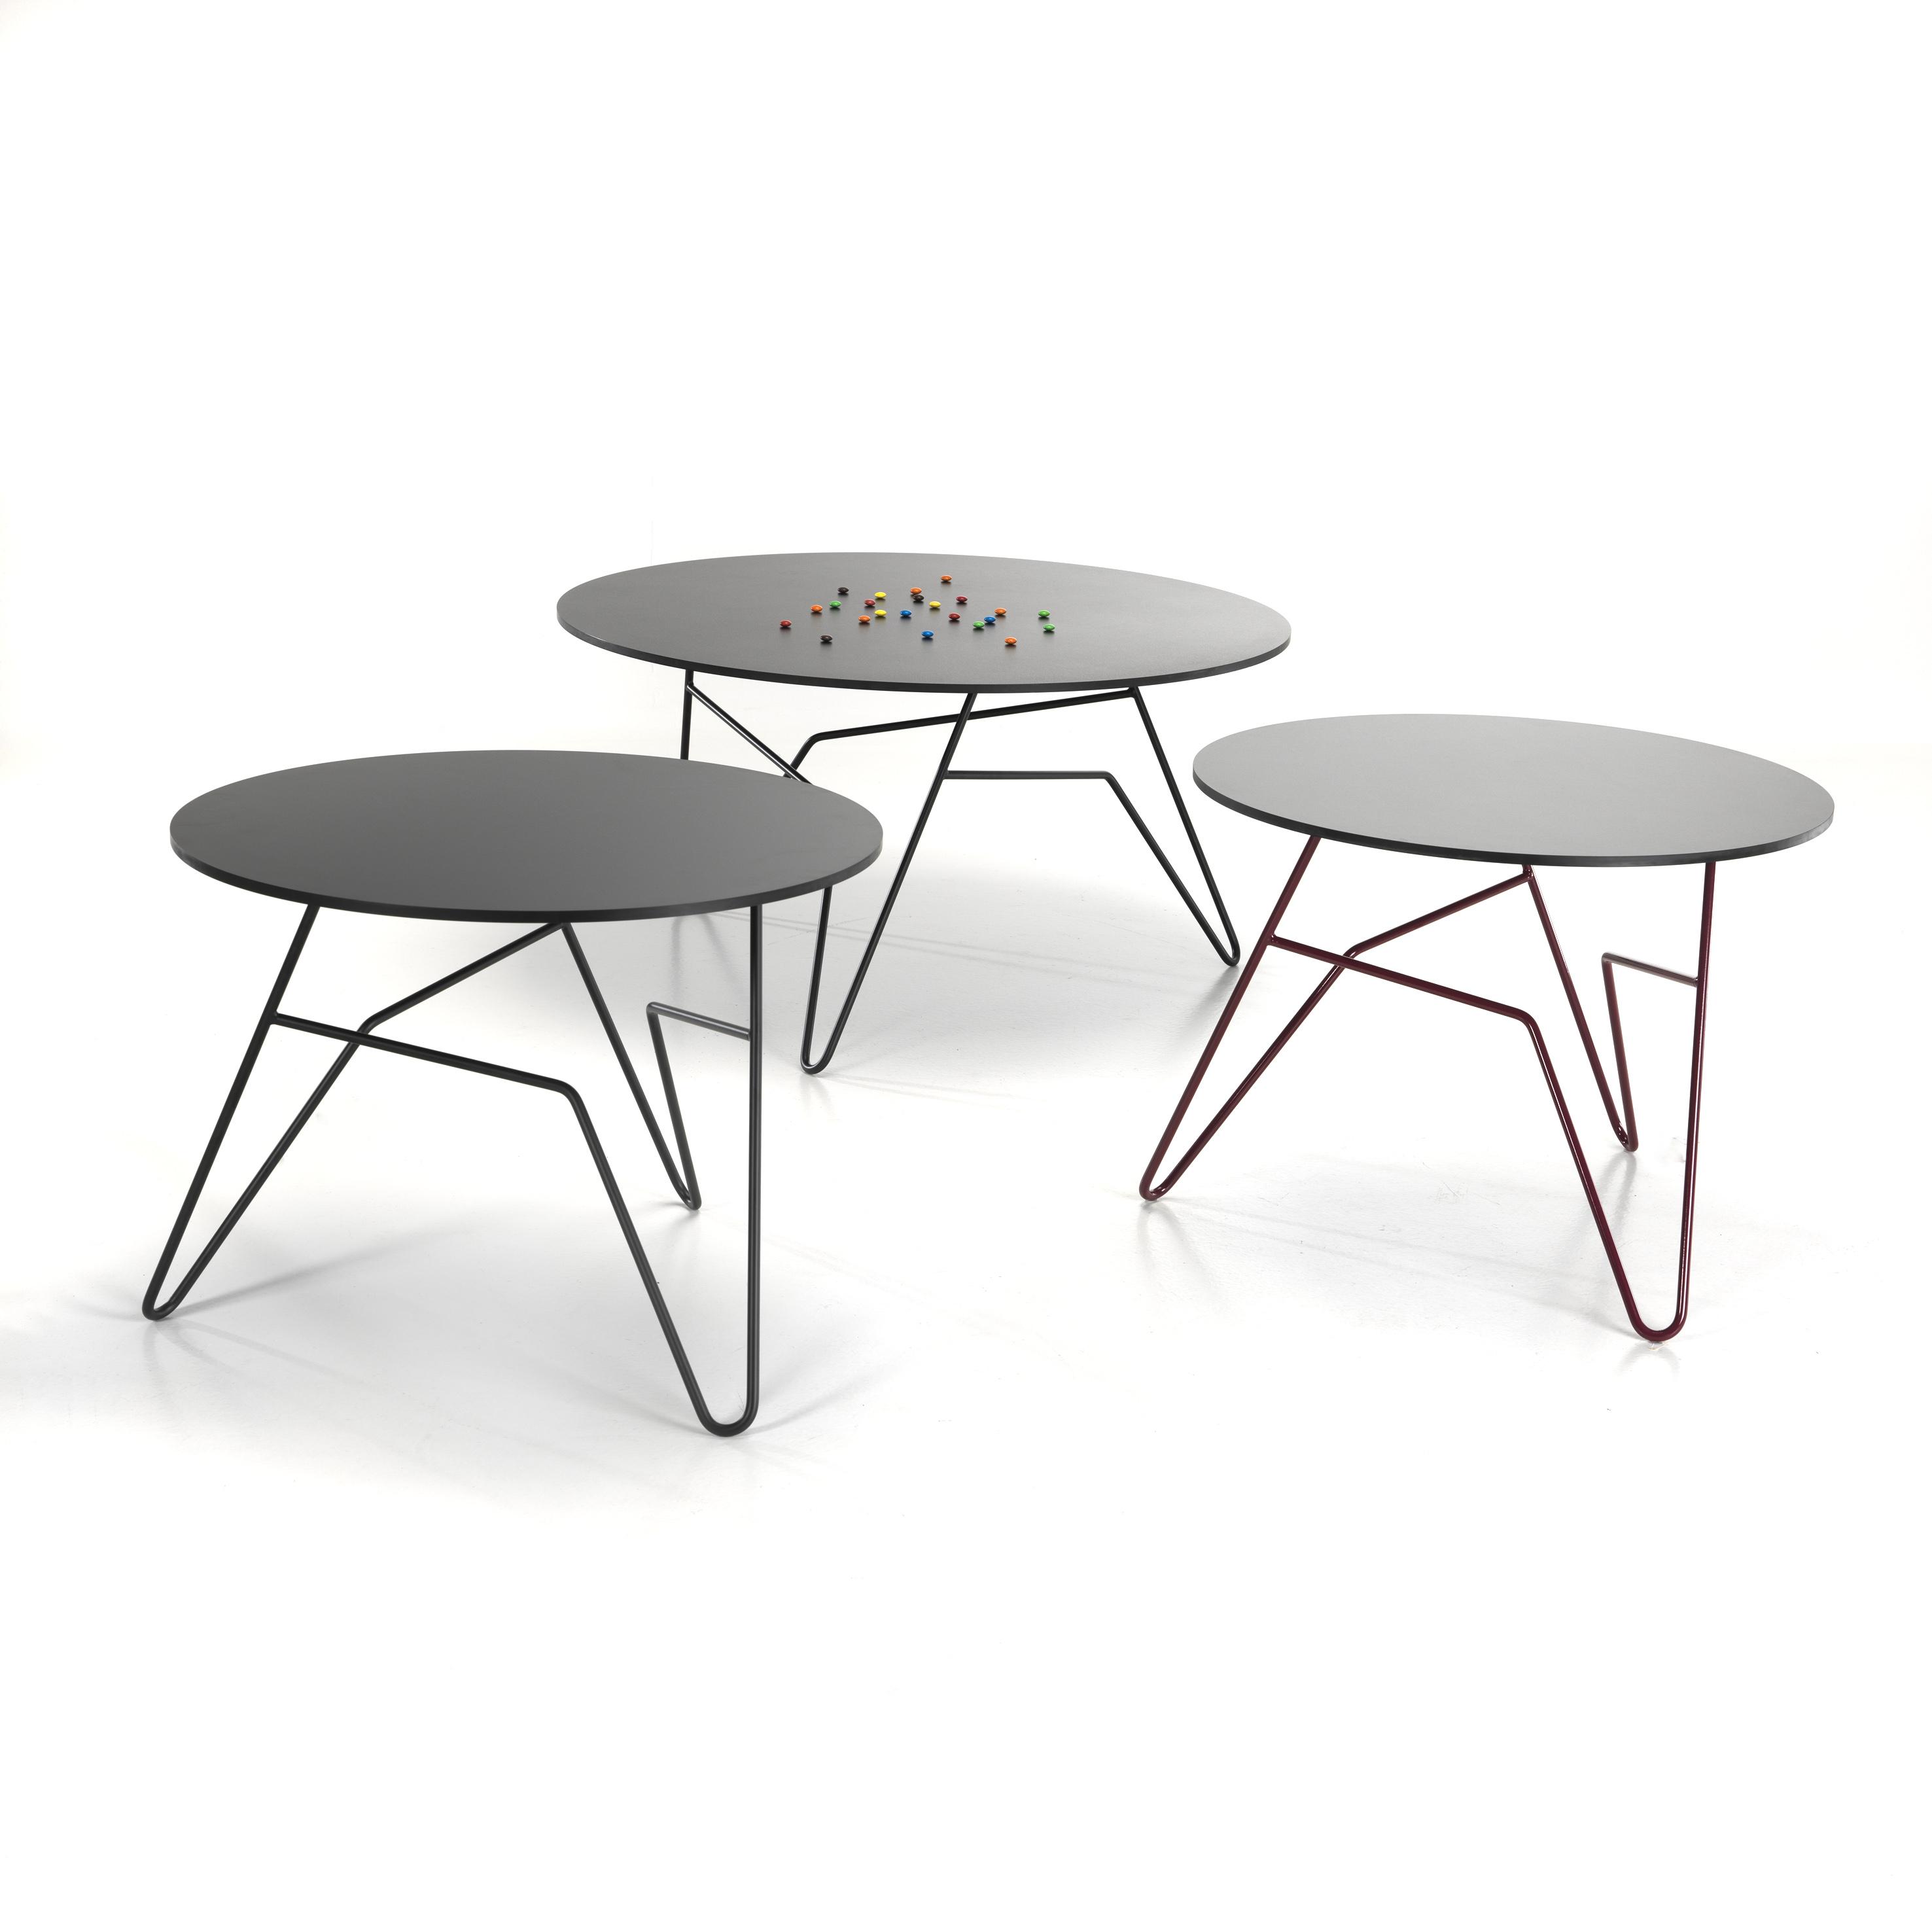 Image of Twist Table Ø60 Sort - Sort Stel